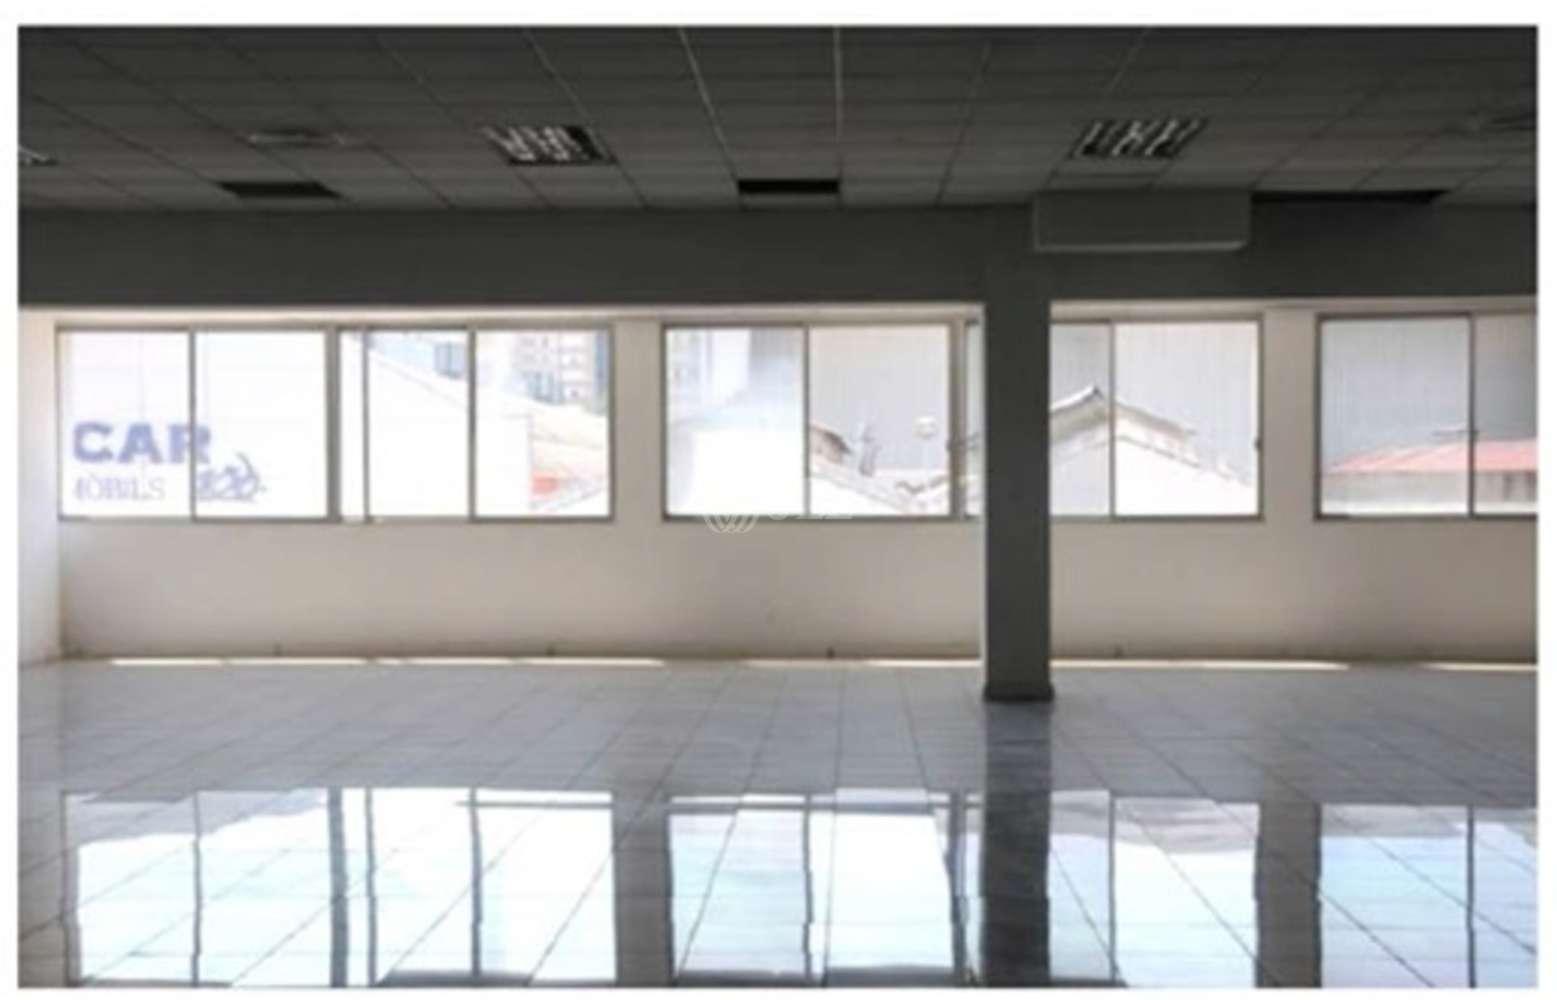 Naves industriales y logísticas L'hospitalet de llobregat, 08907 - Nave Industrial - B0046 - PI ALMEDA - 2879